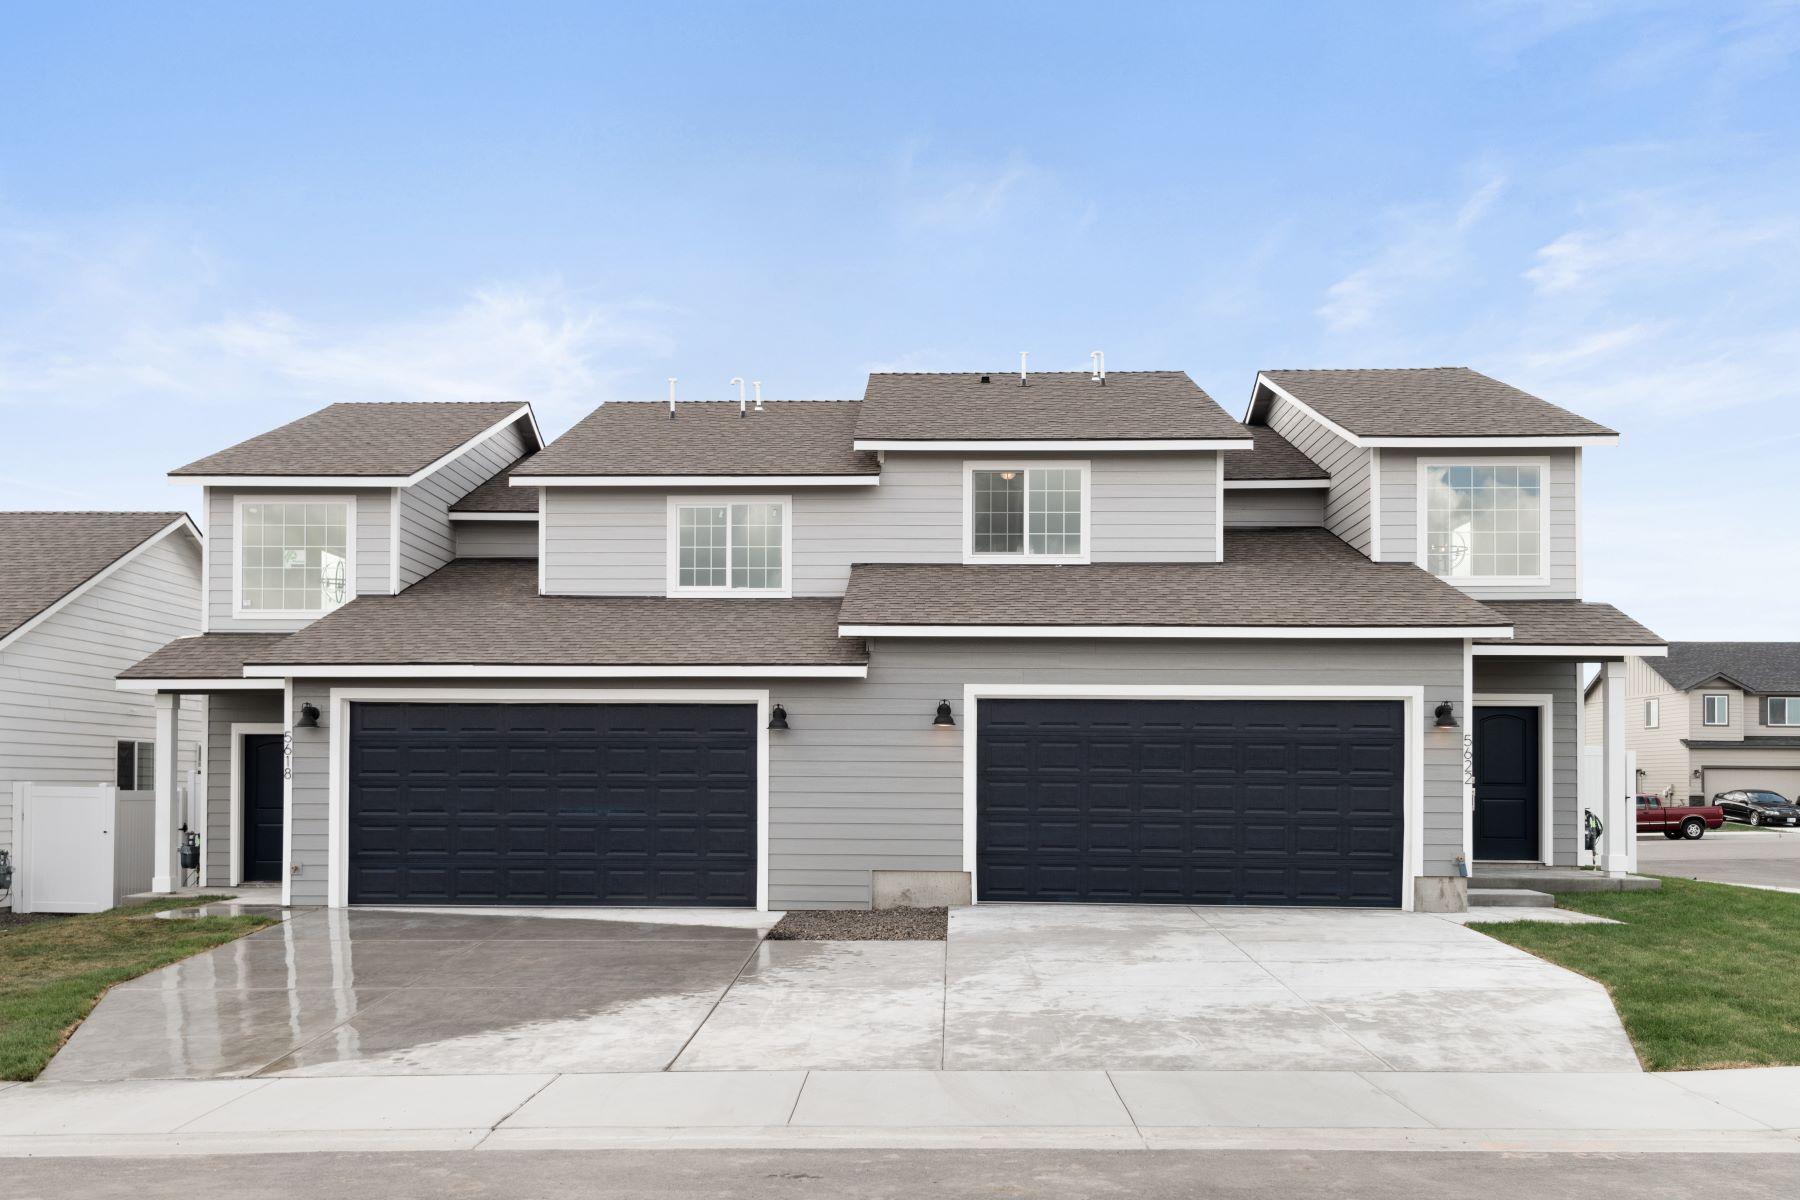 Single Family Homes for Sale at Large Cul-de-Sac Location 5222 Remington Drive Pasco, Washington 99301 United States